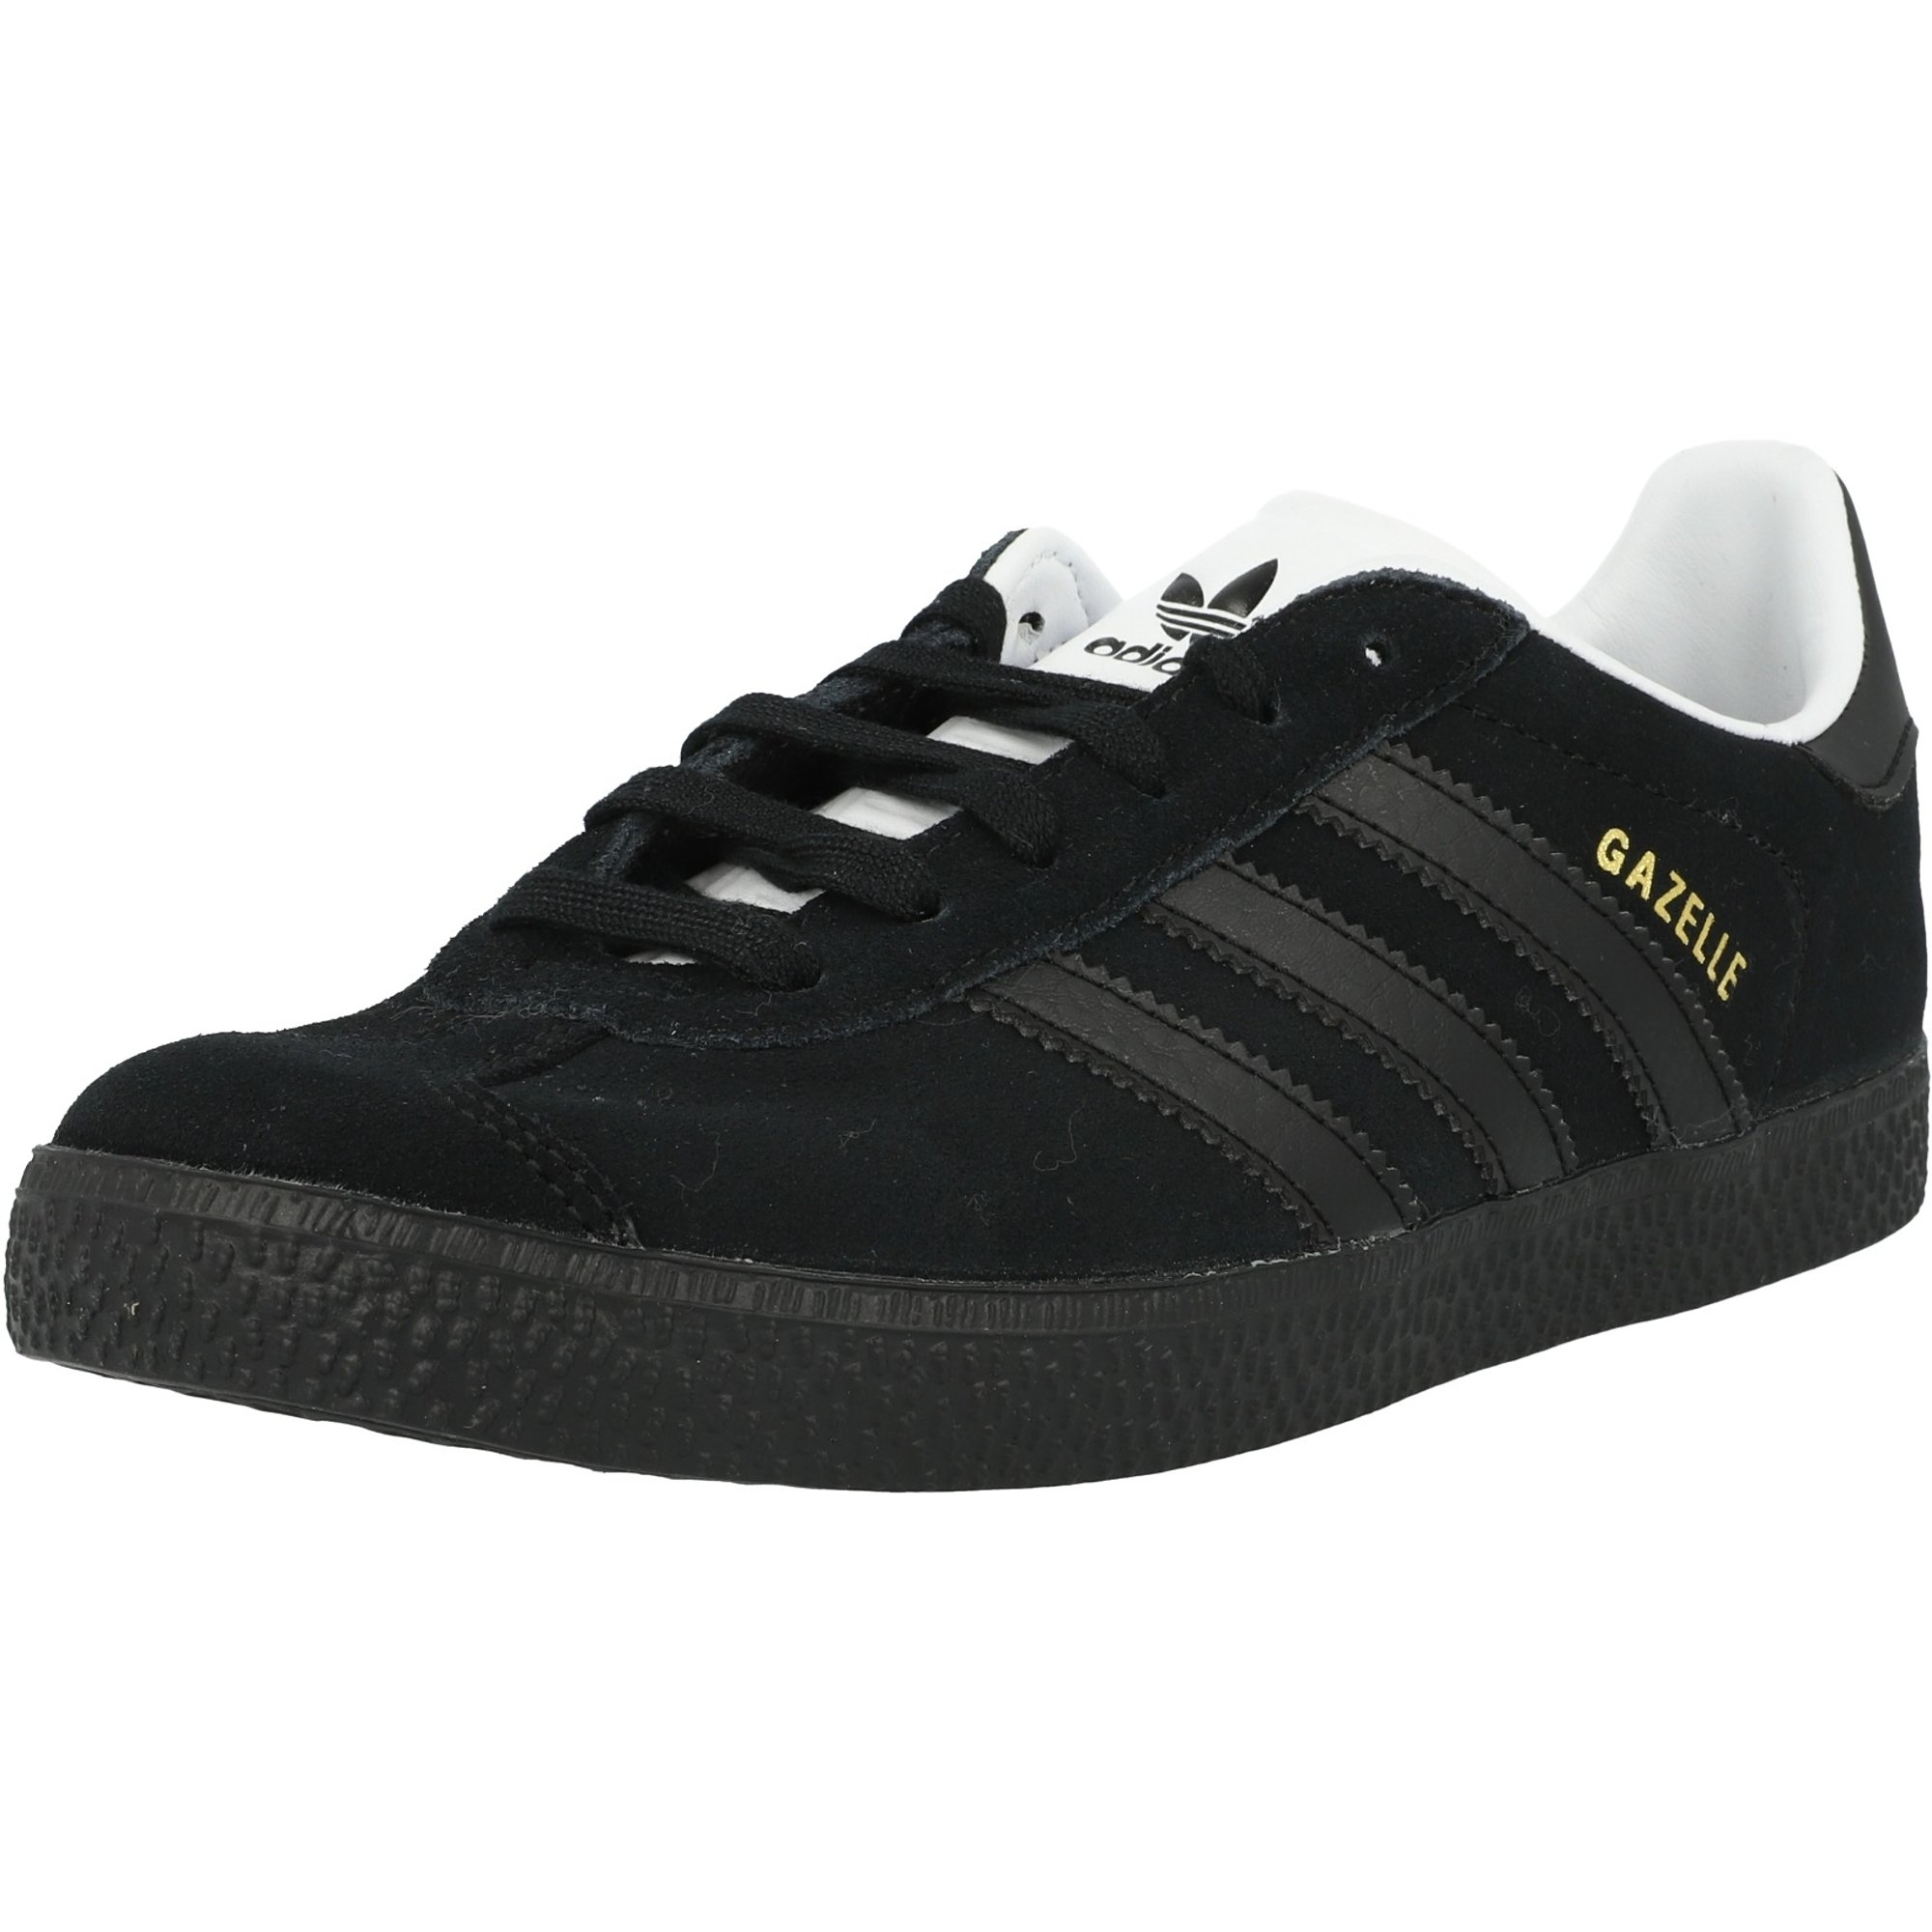 adidas Originals Gazelle J Black/Gold